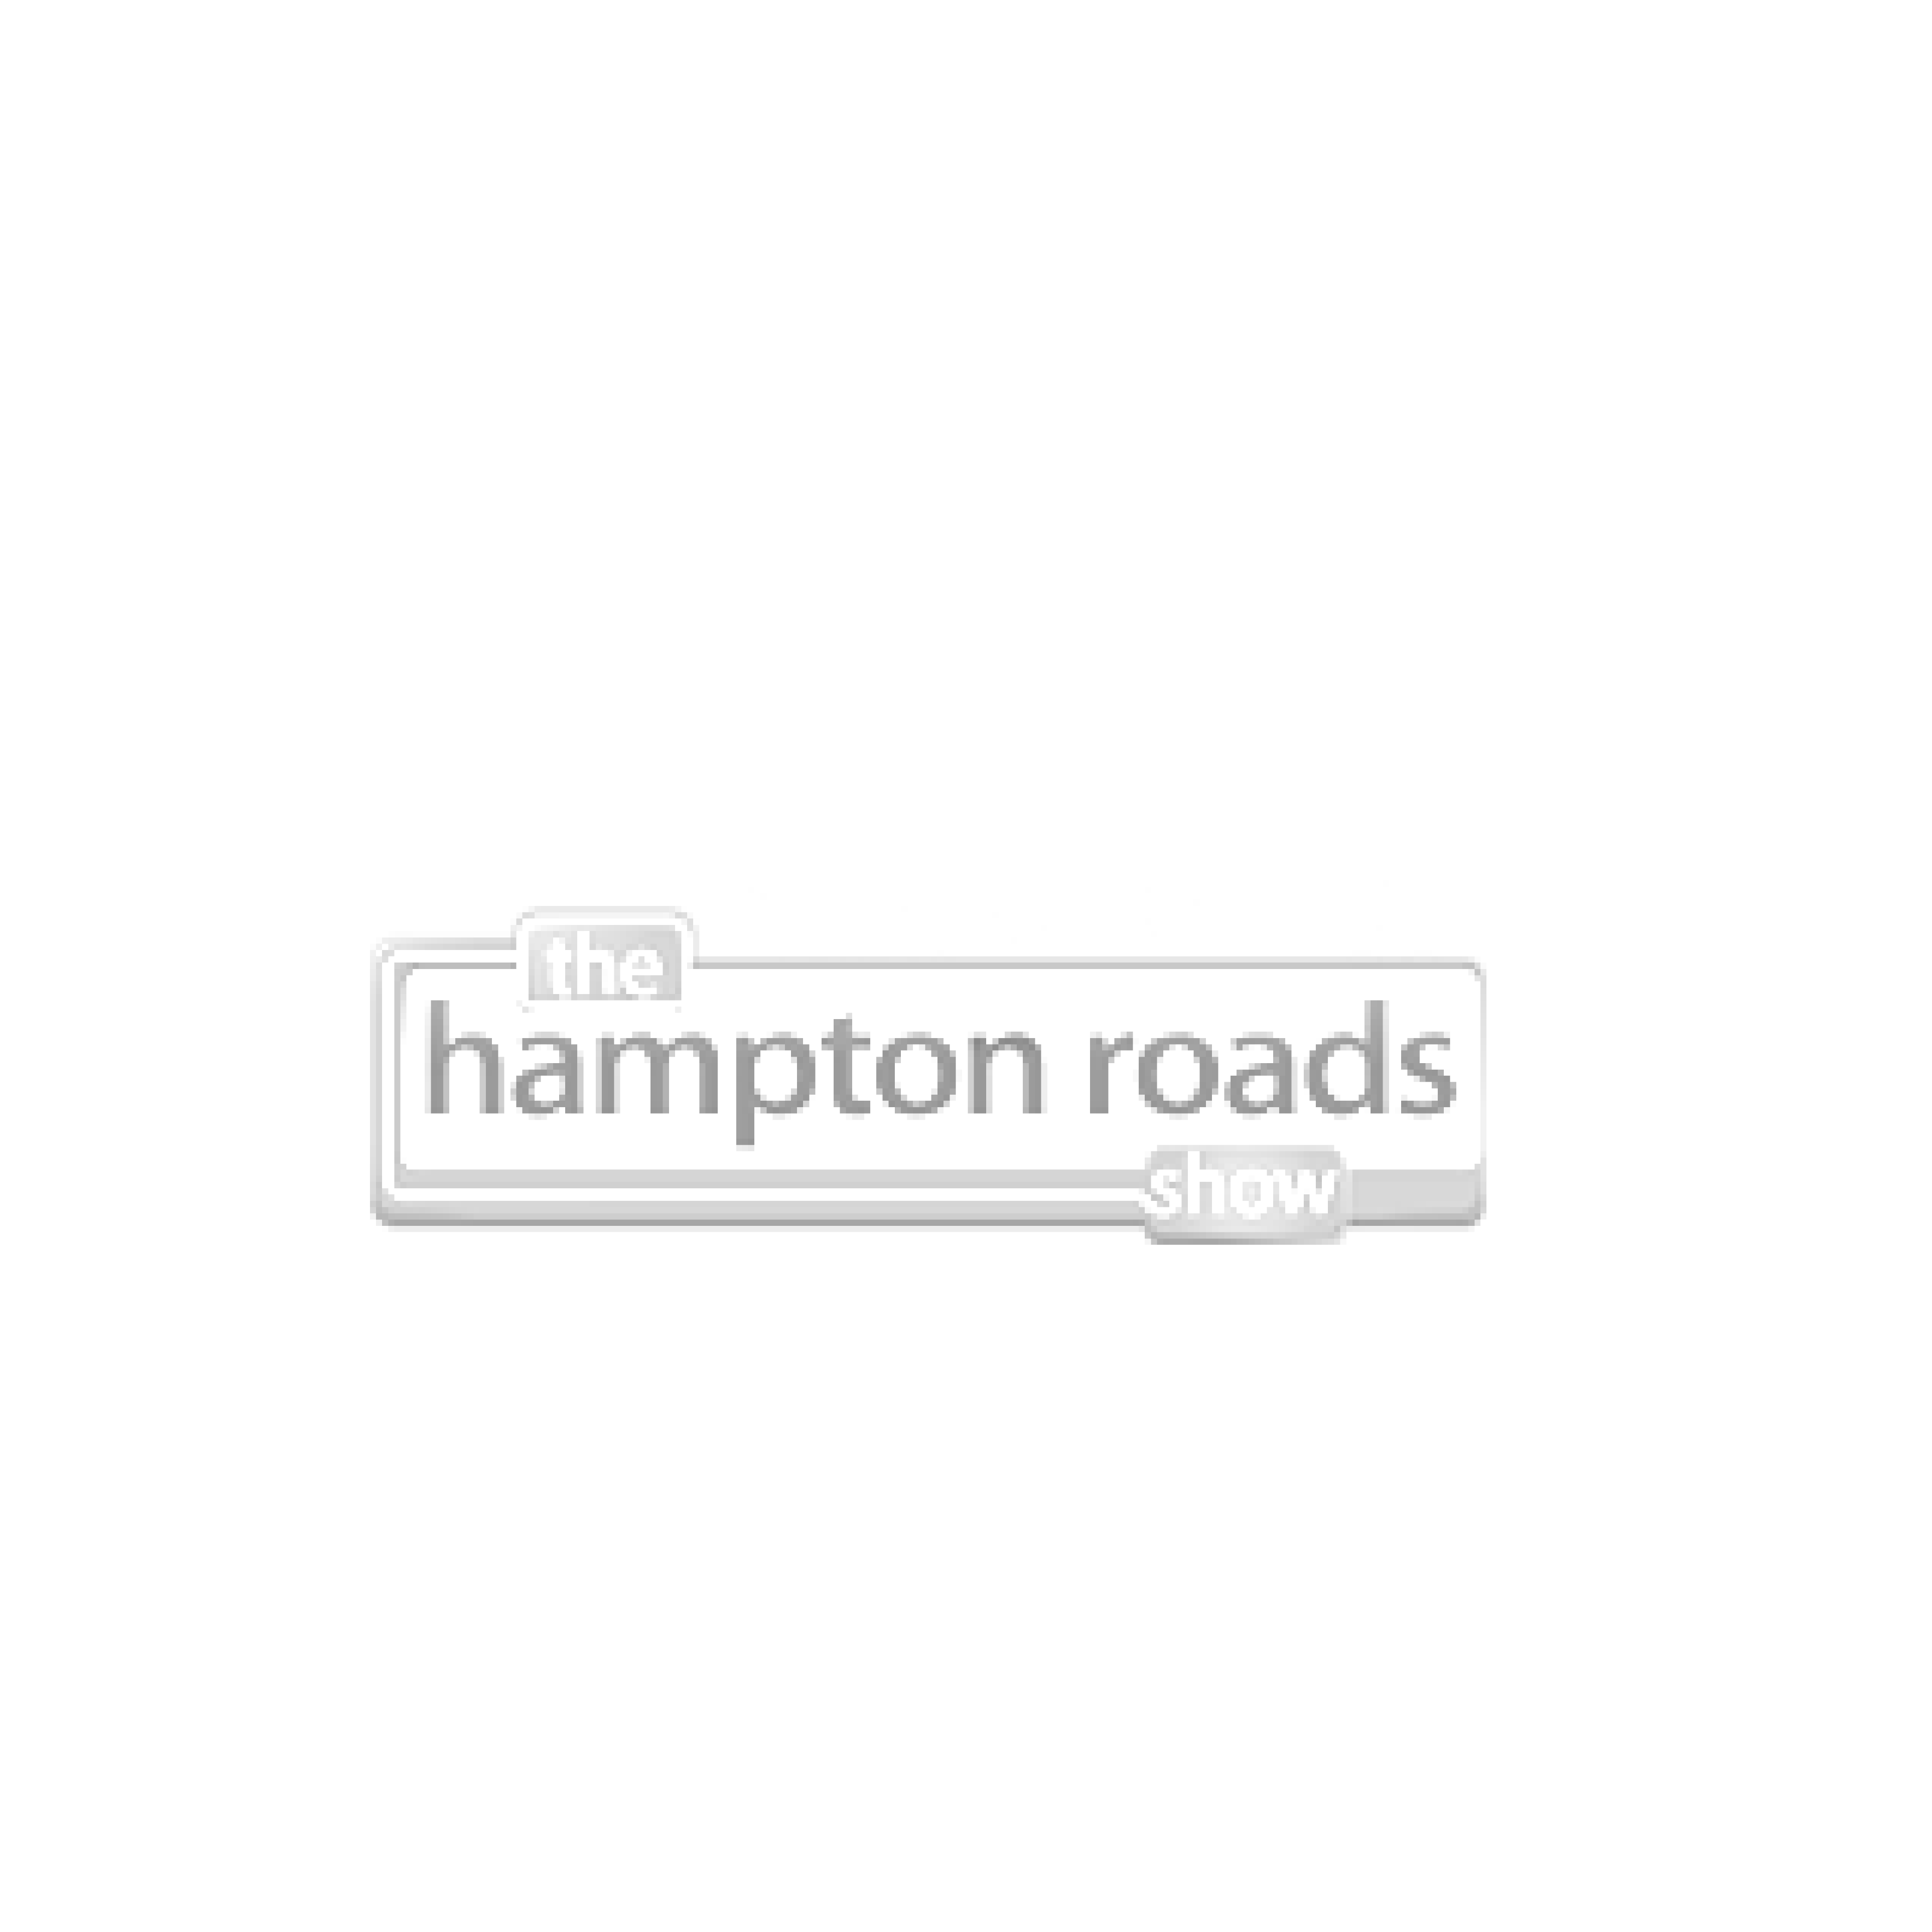 THE HAMPTON ROADS SHOW